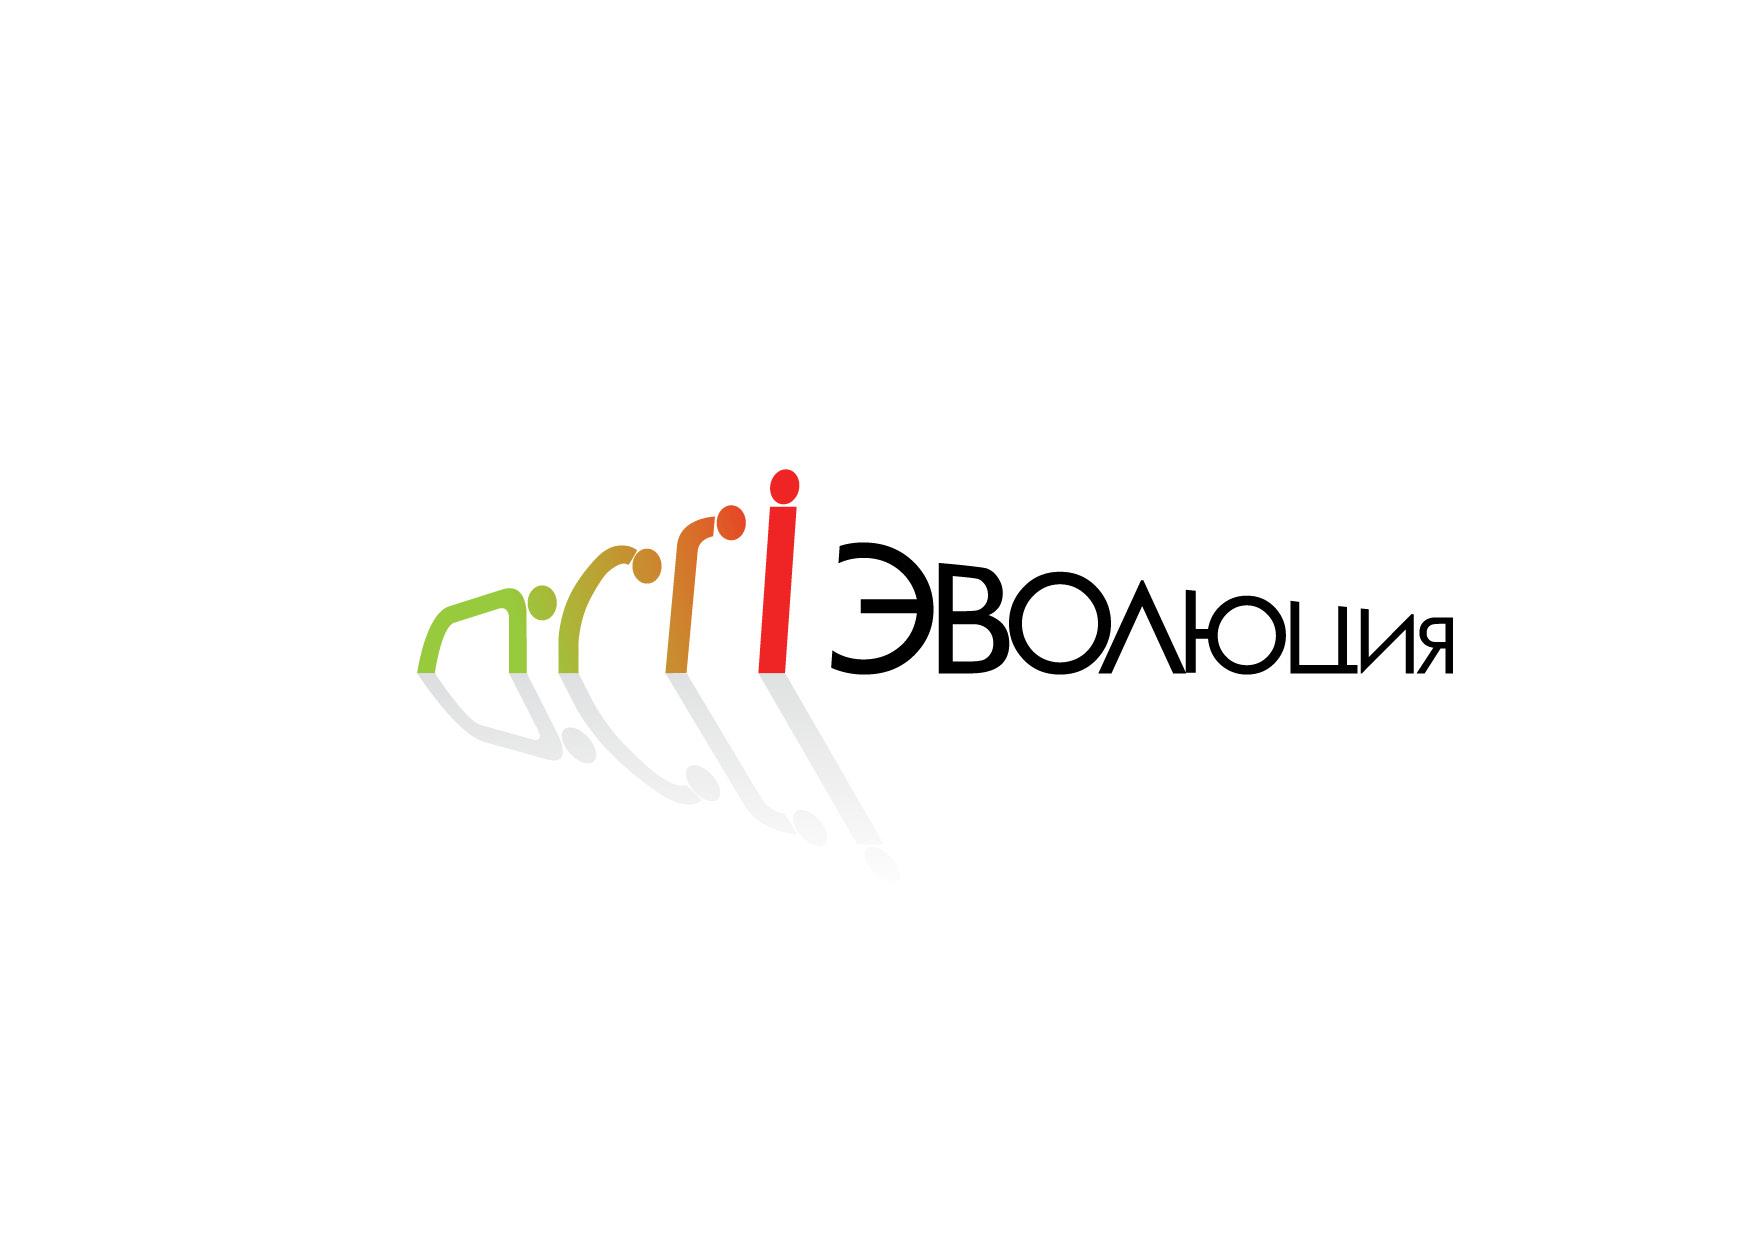 Разработать логотип для Онлайн-школы и сообщества фото f_9535bc0ed7b4e5f8.jpg